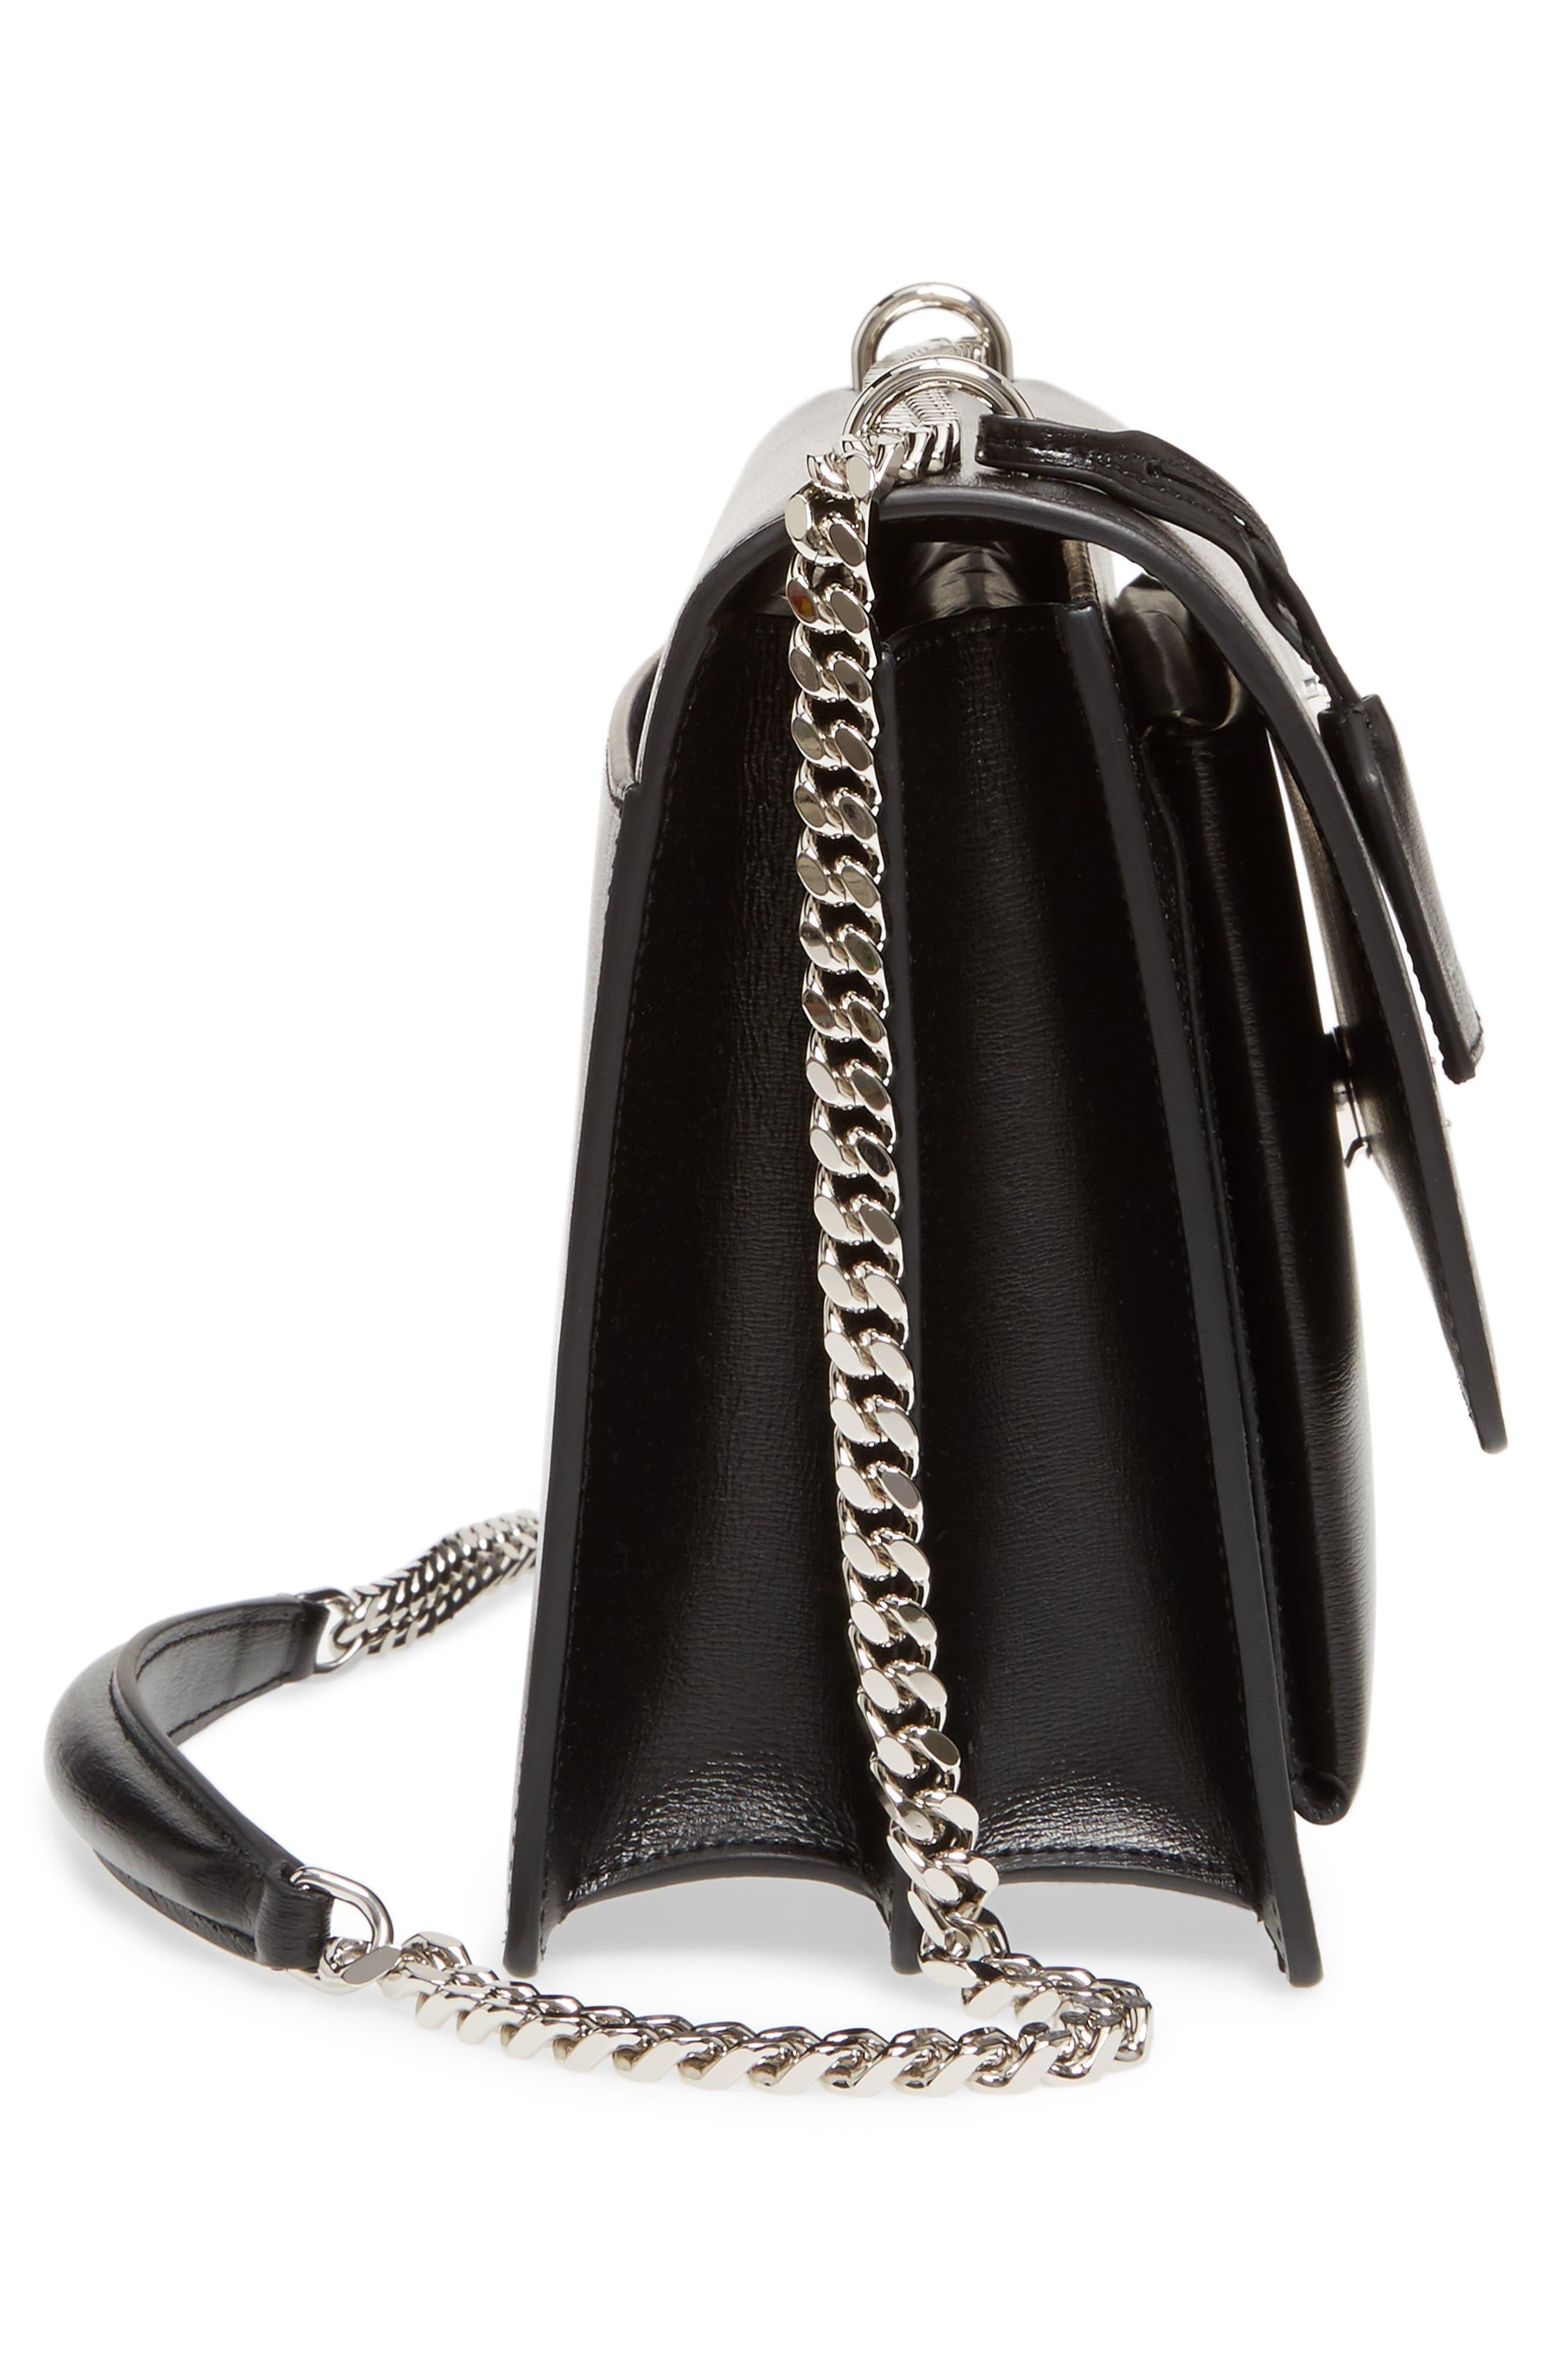 Medium Sunset Leather Shoulder Bag,                             Alternate thumbnail 5, color,                             NOIR